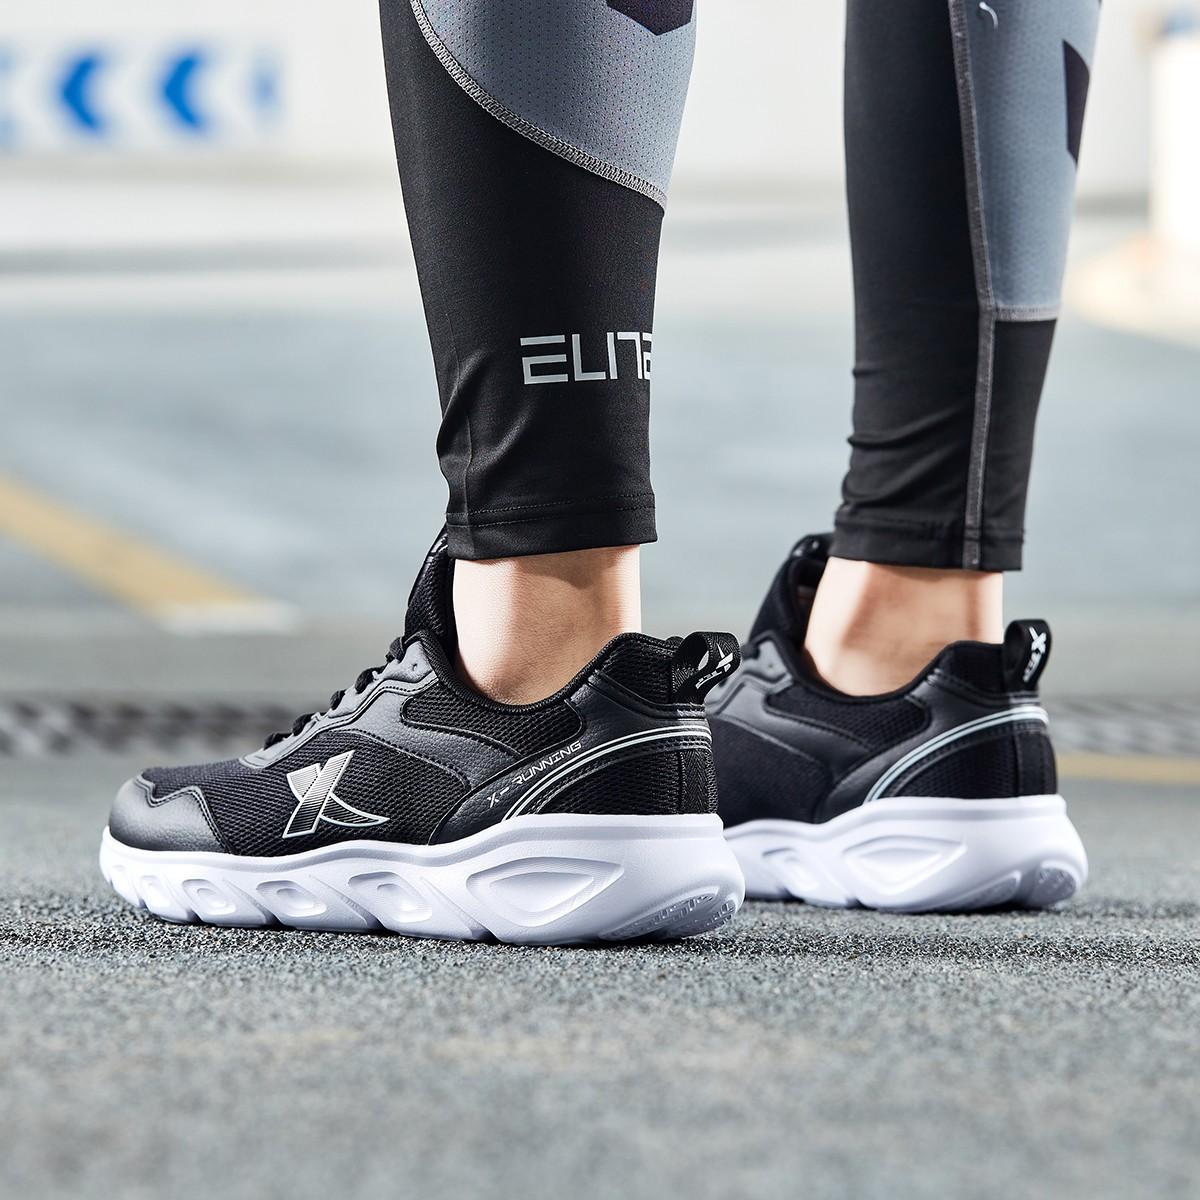 XTEP 特步 8801191150360201 男子跑鞋